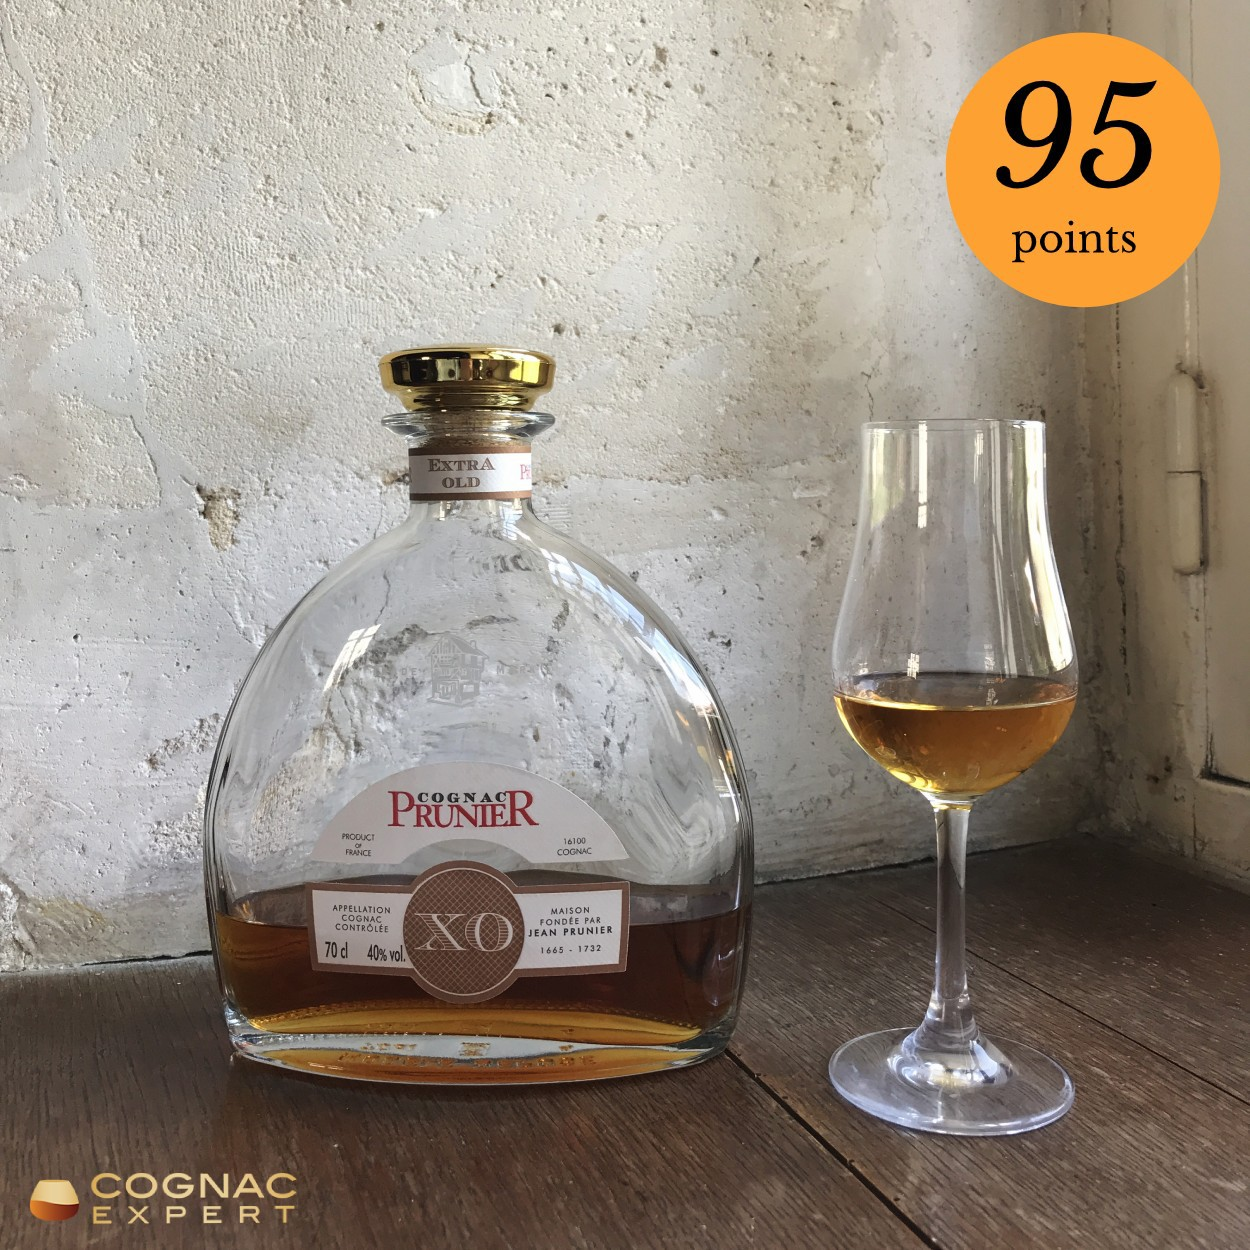 Prunier XO Cognac bottle and glass